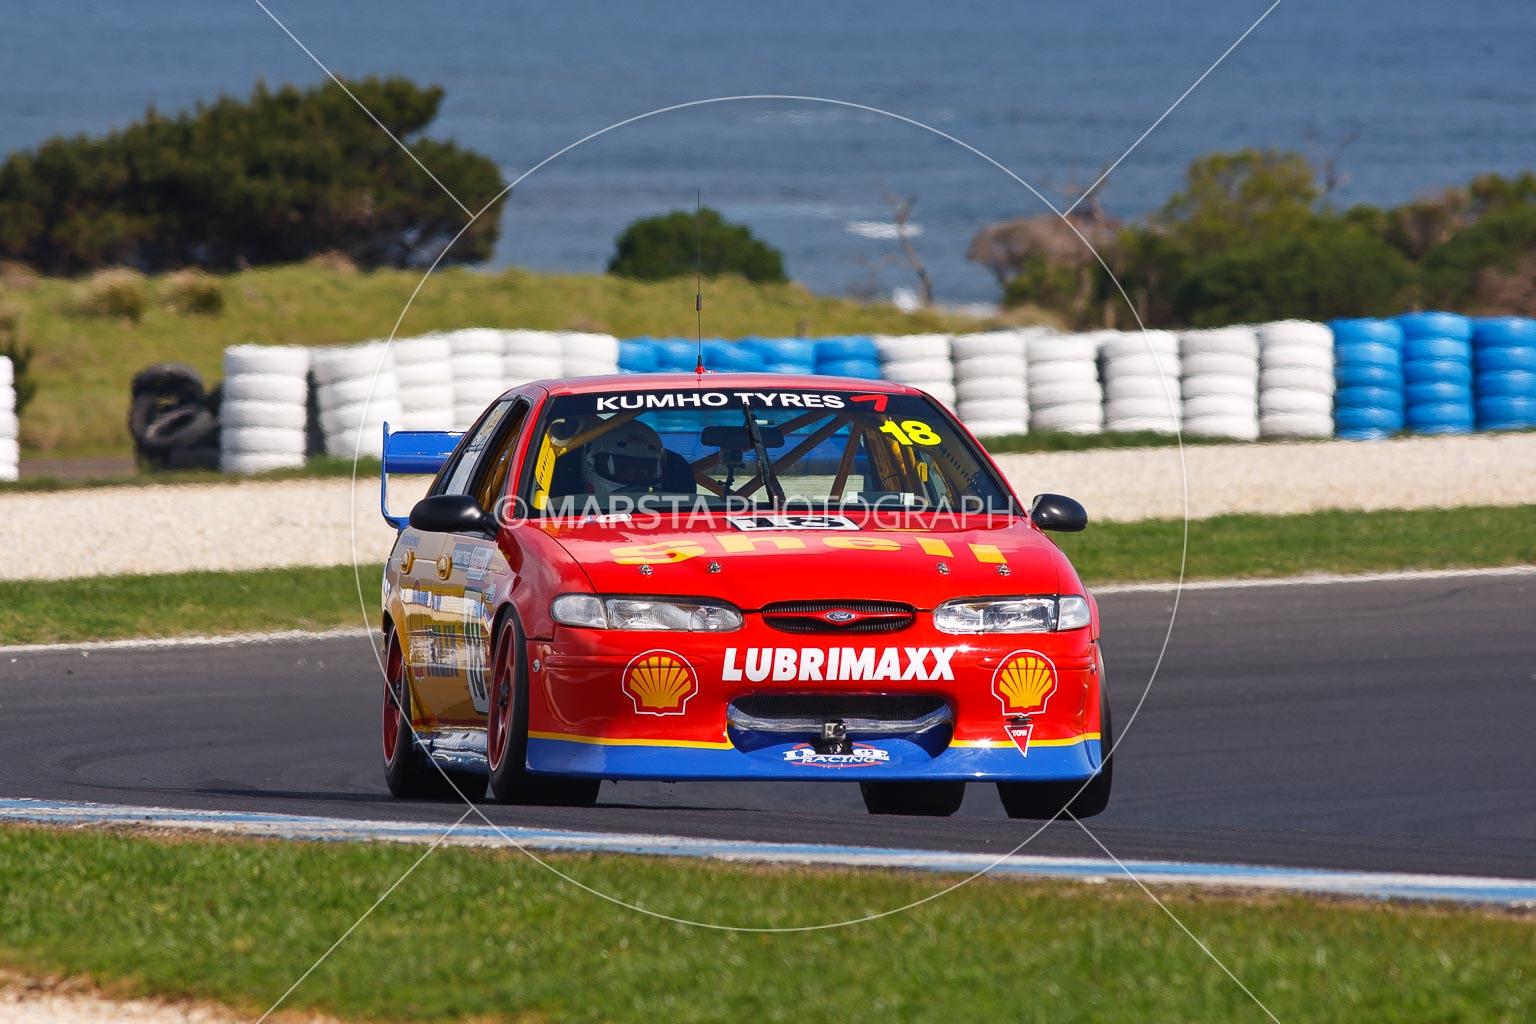 (18);23 September 2012;Australia;Ford Falcon EL;Leigh Moran;Phillip Island;Shannons Nationals;V8 Touring Cars;VIC;Victoria;auto;motorsport;racing;super telephoto